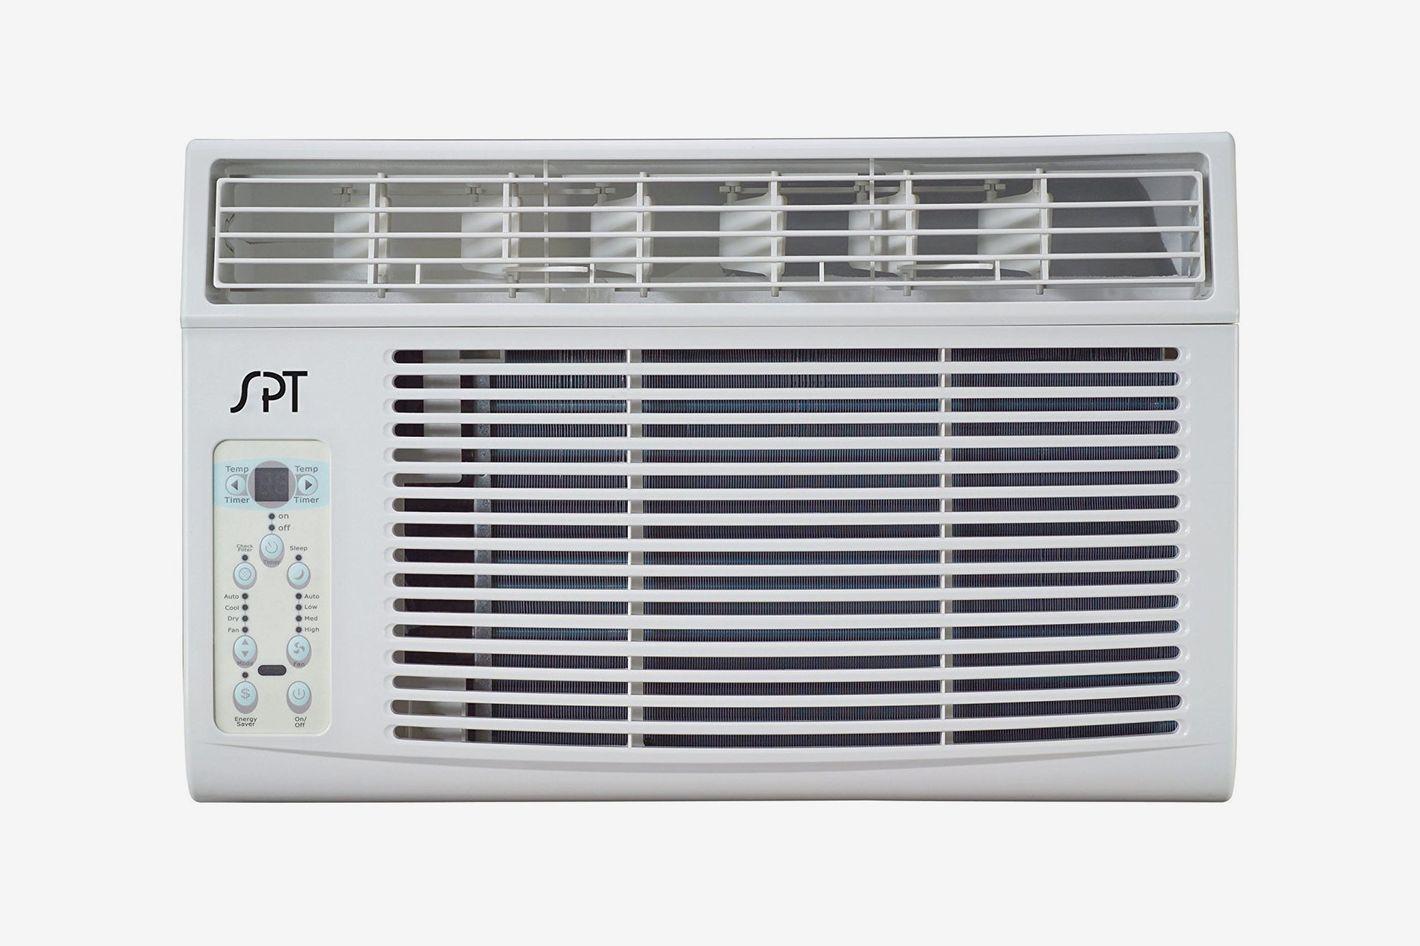 SPT 12,000 BTU Window Air Conditioner — Energy Star